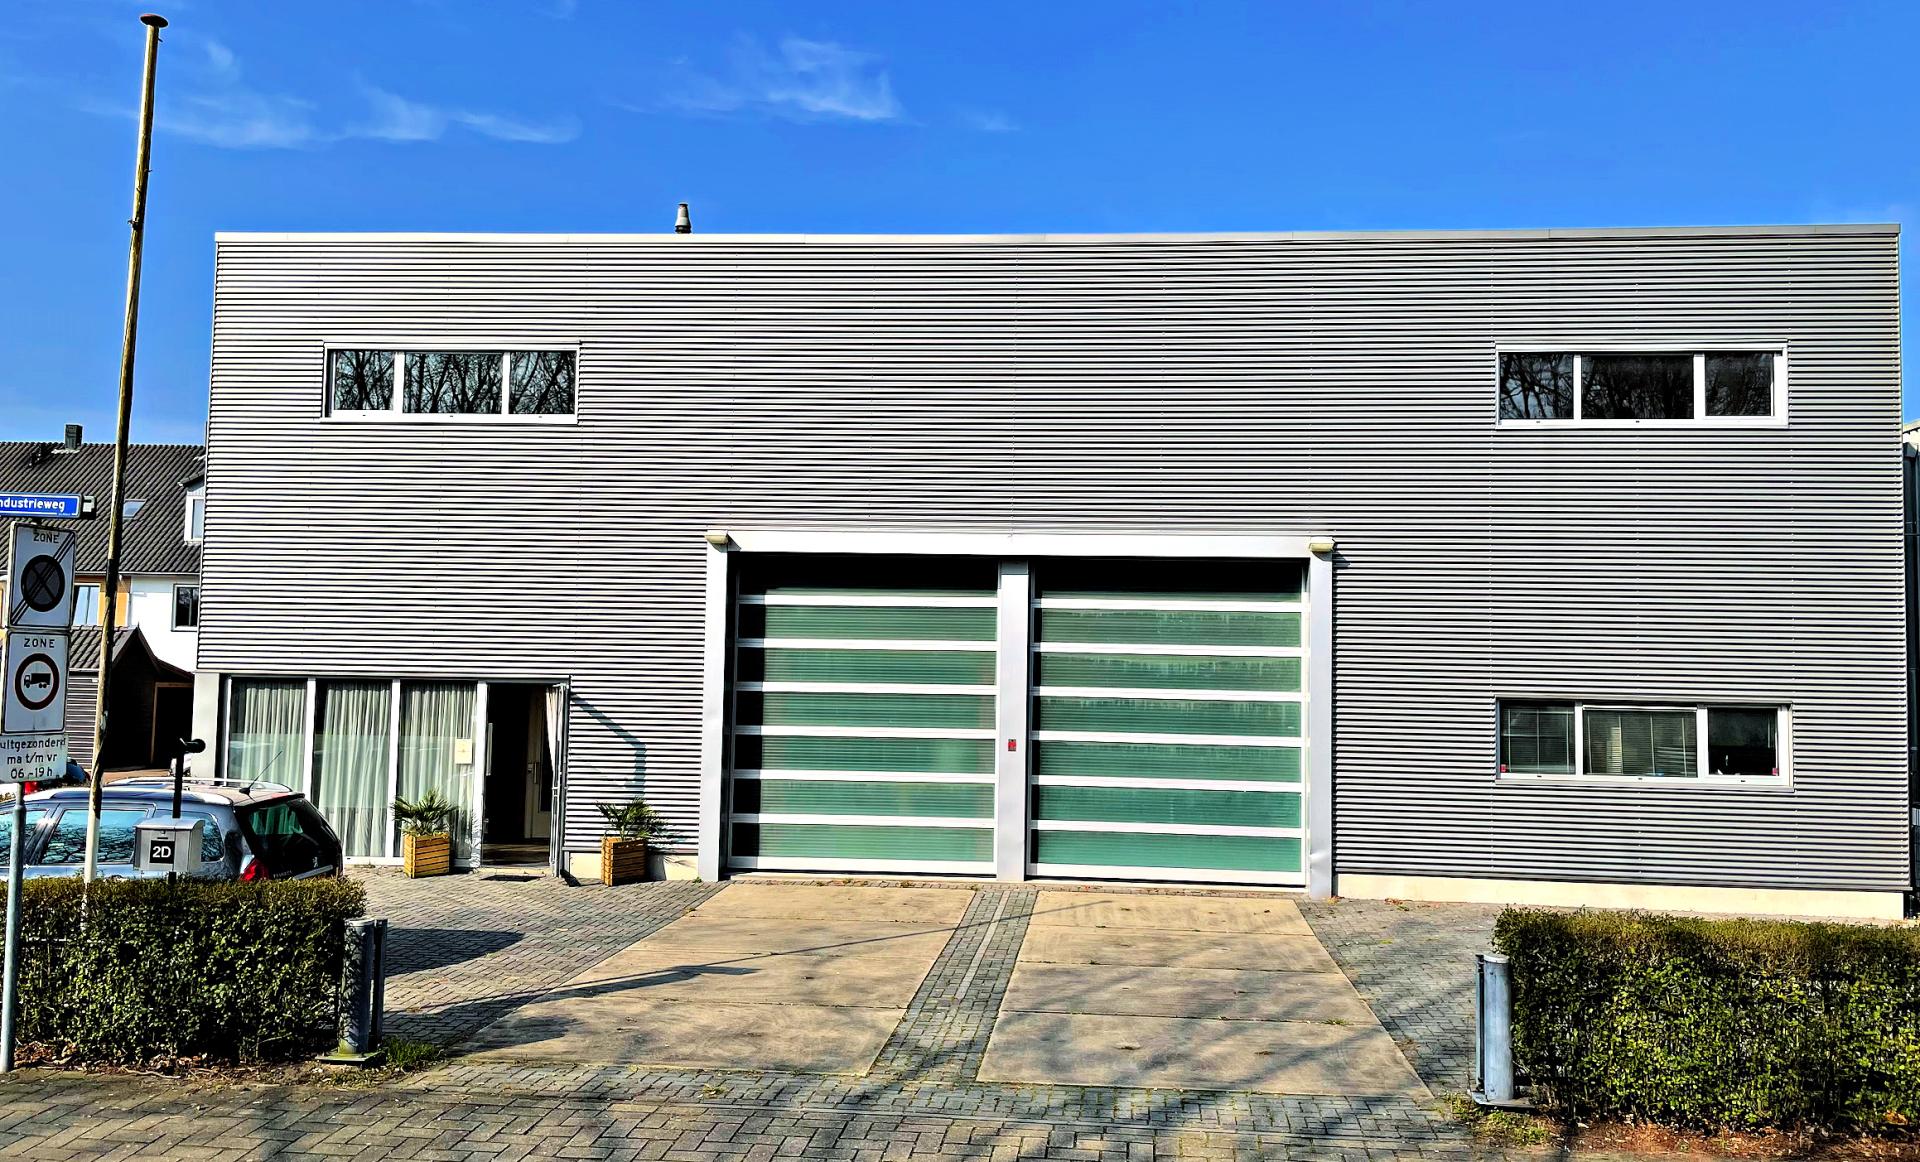 www.opstellen.com in Nieuwegein